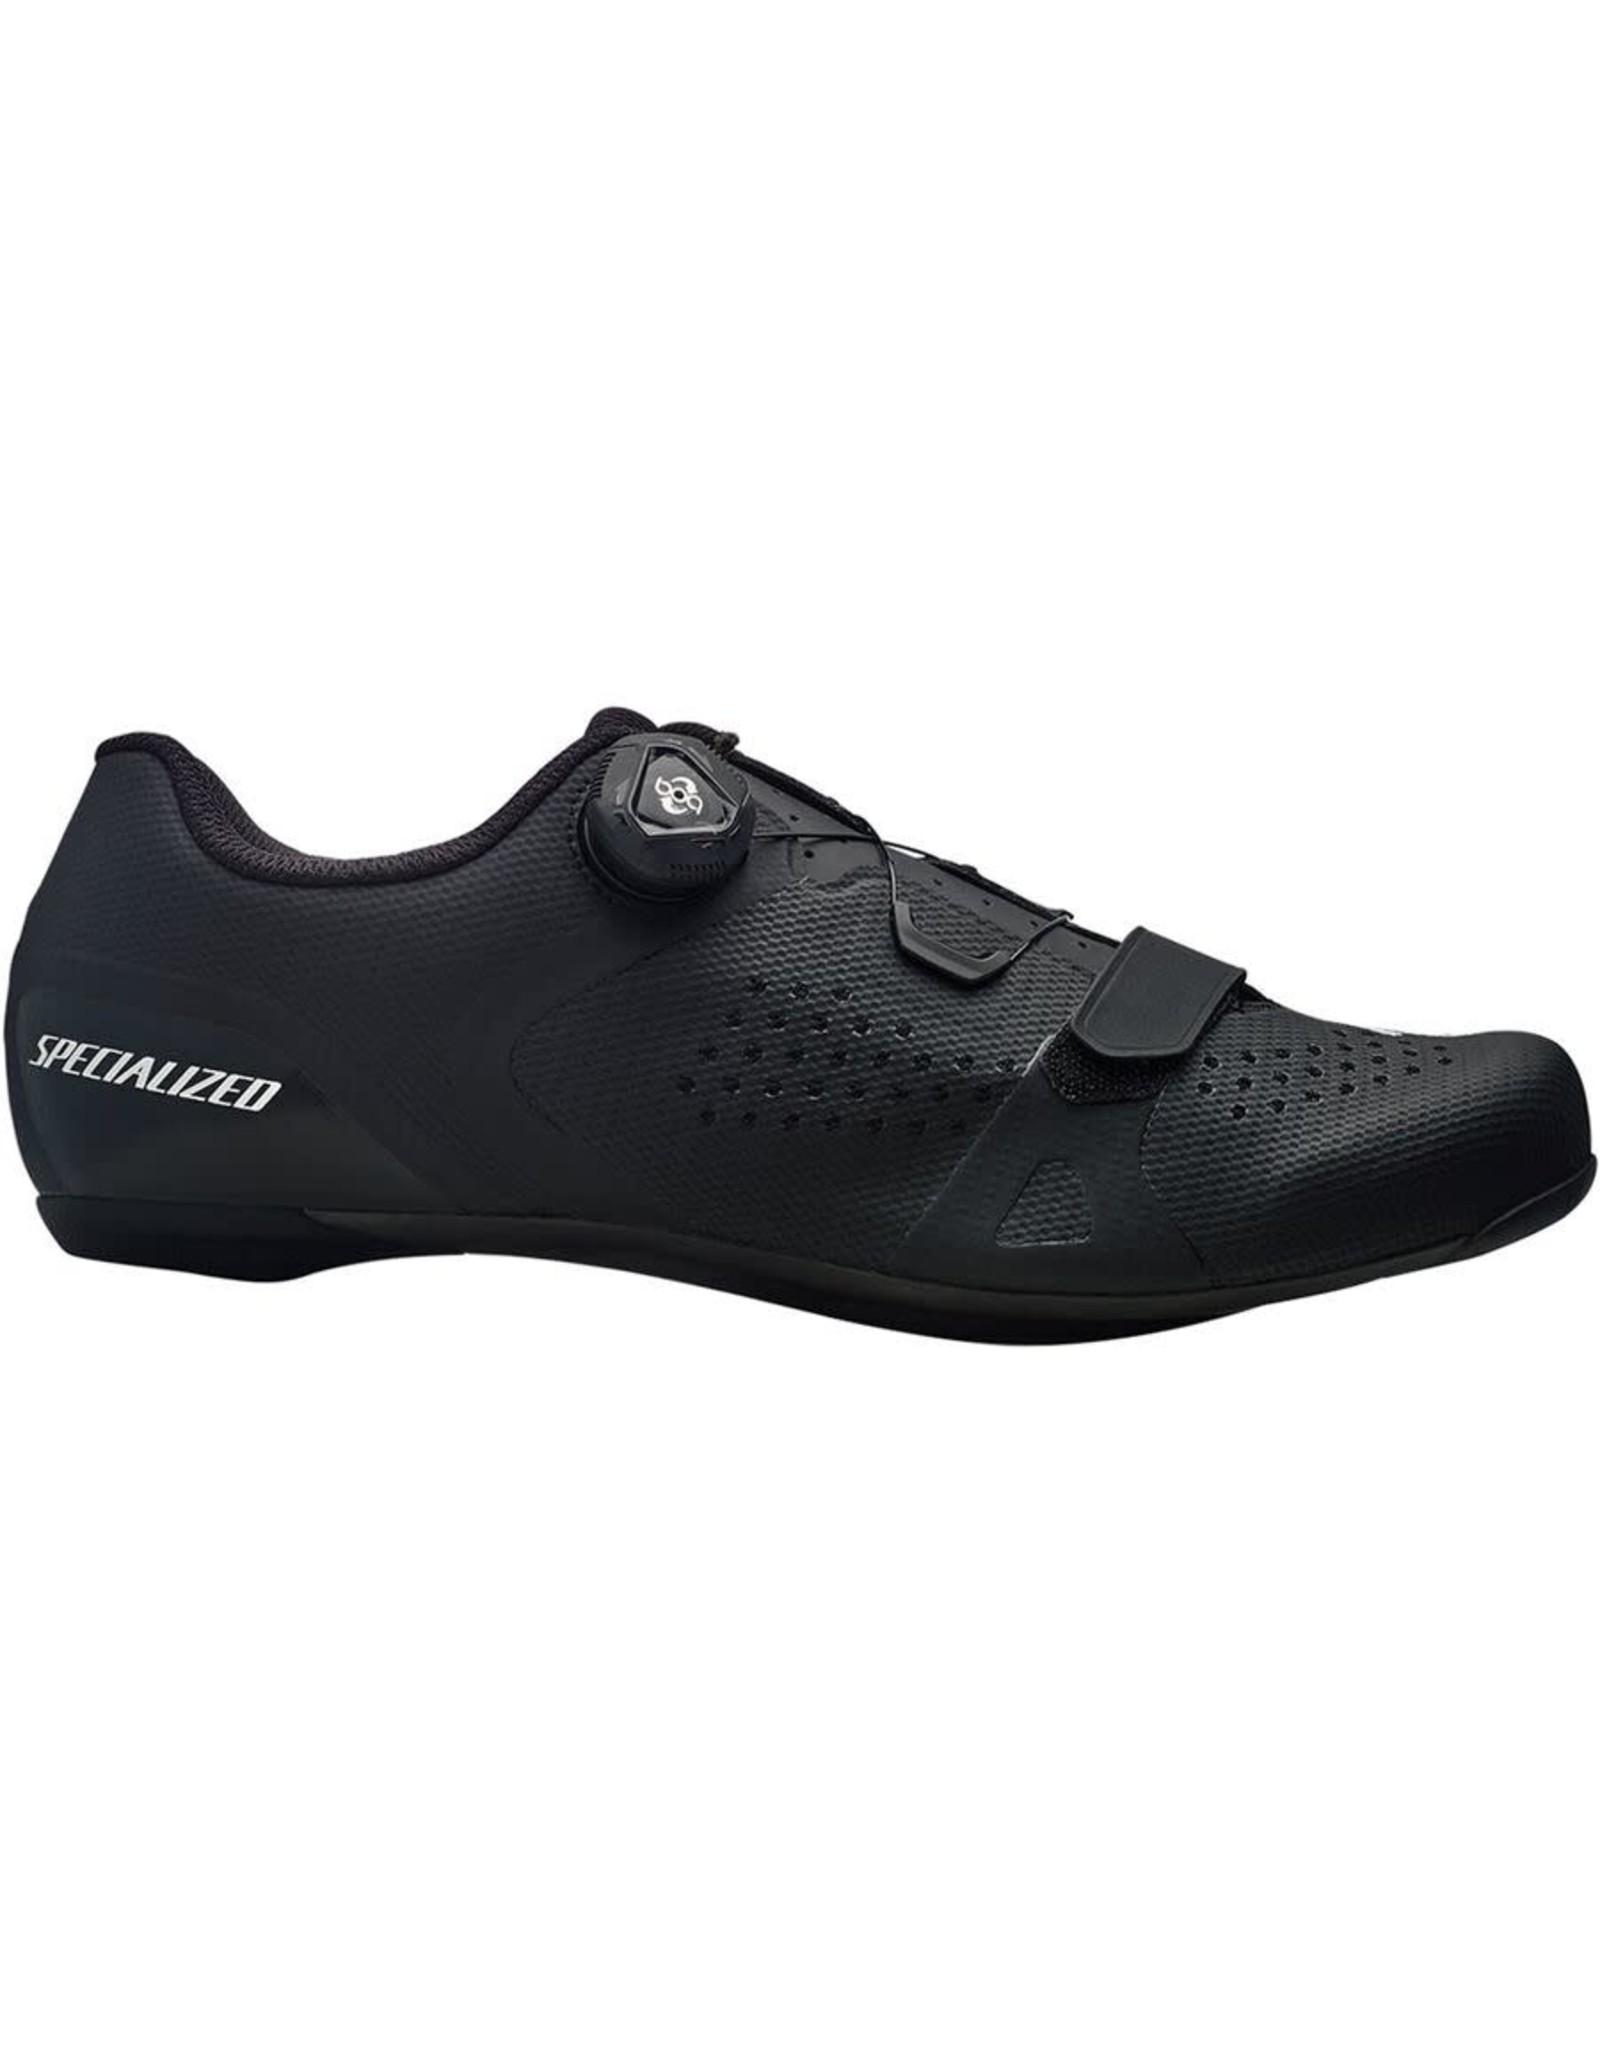 Specialized Shoe Spec Torch 2.0 Road Blk 45